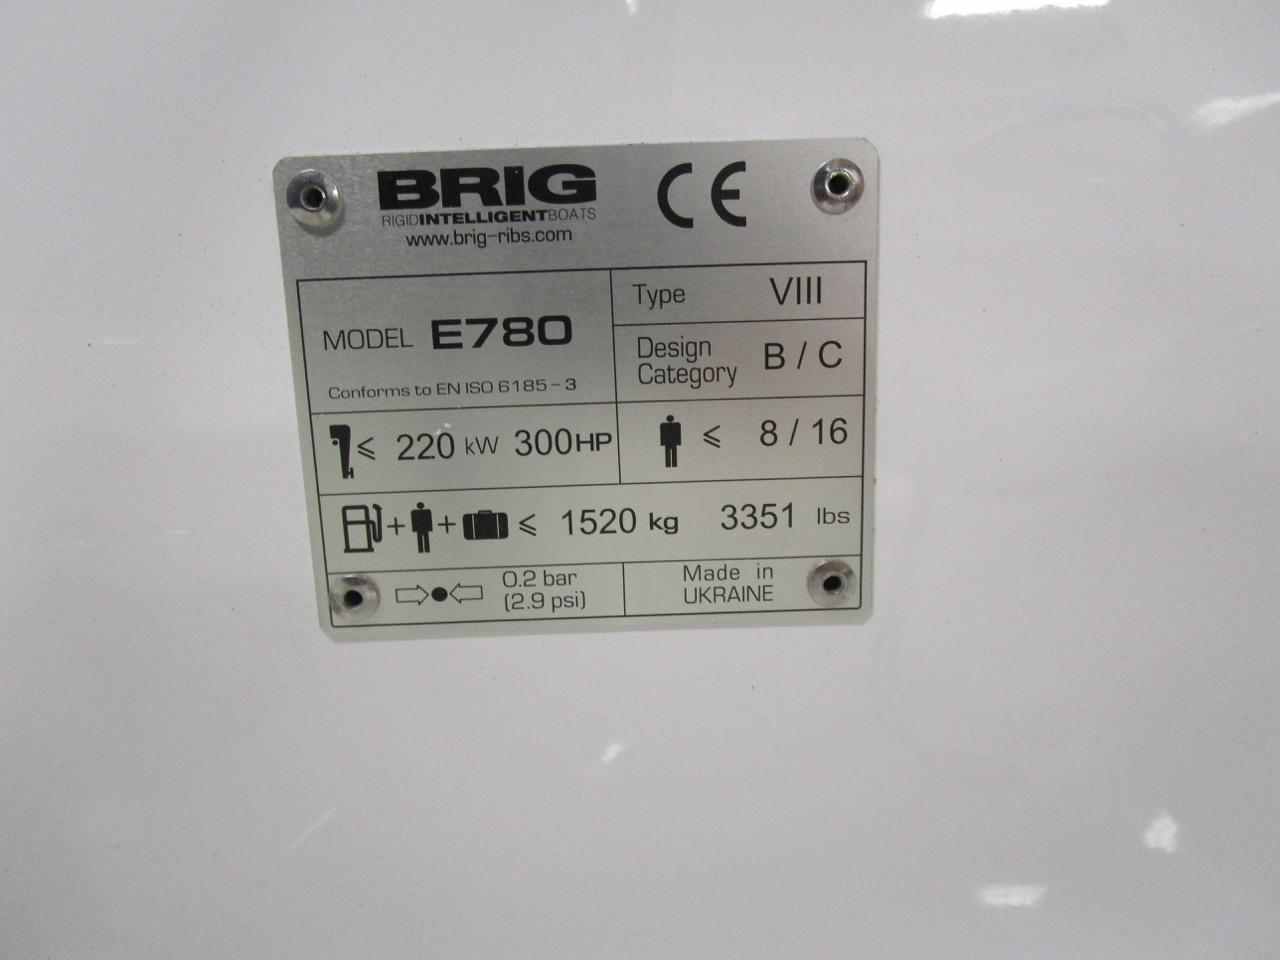 BRIG Eagle 780 CE plate